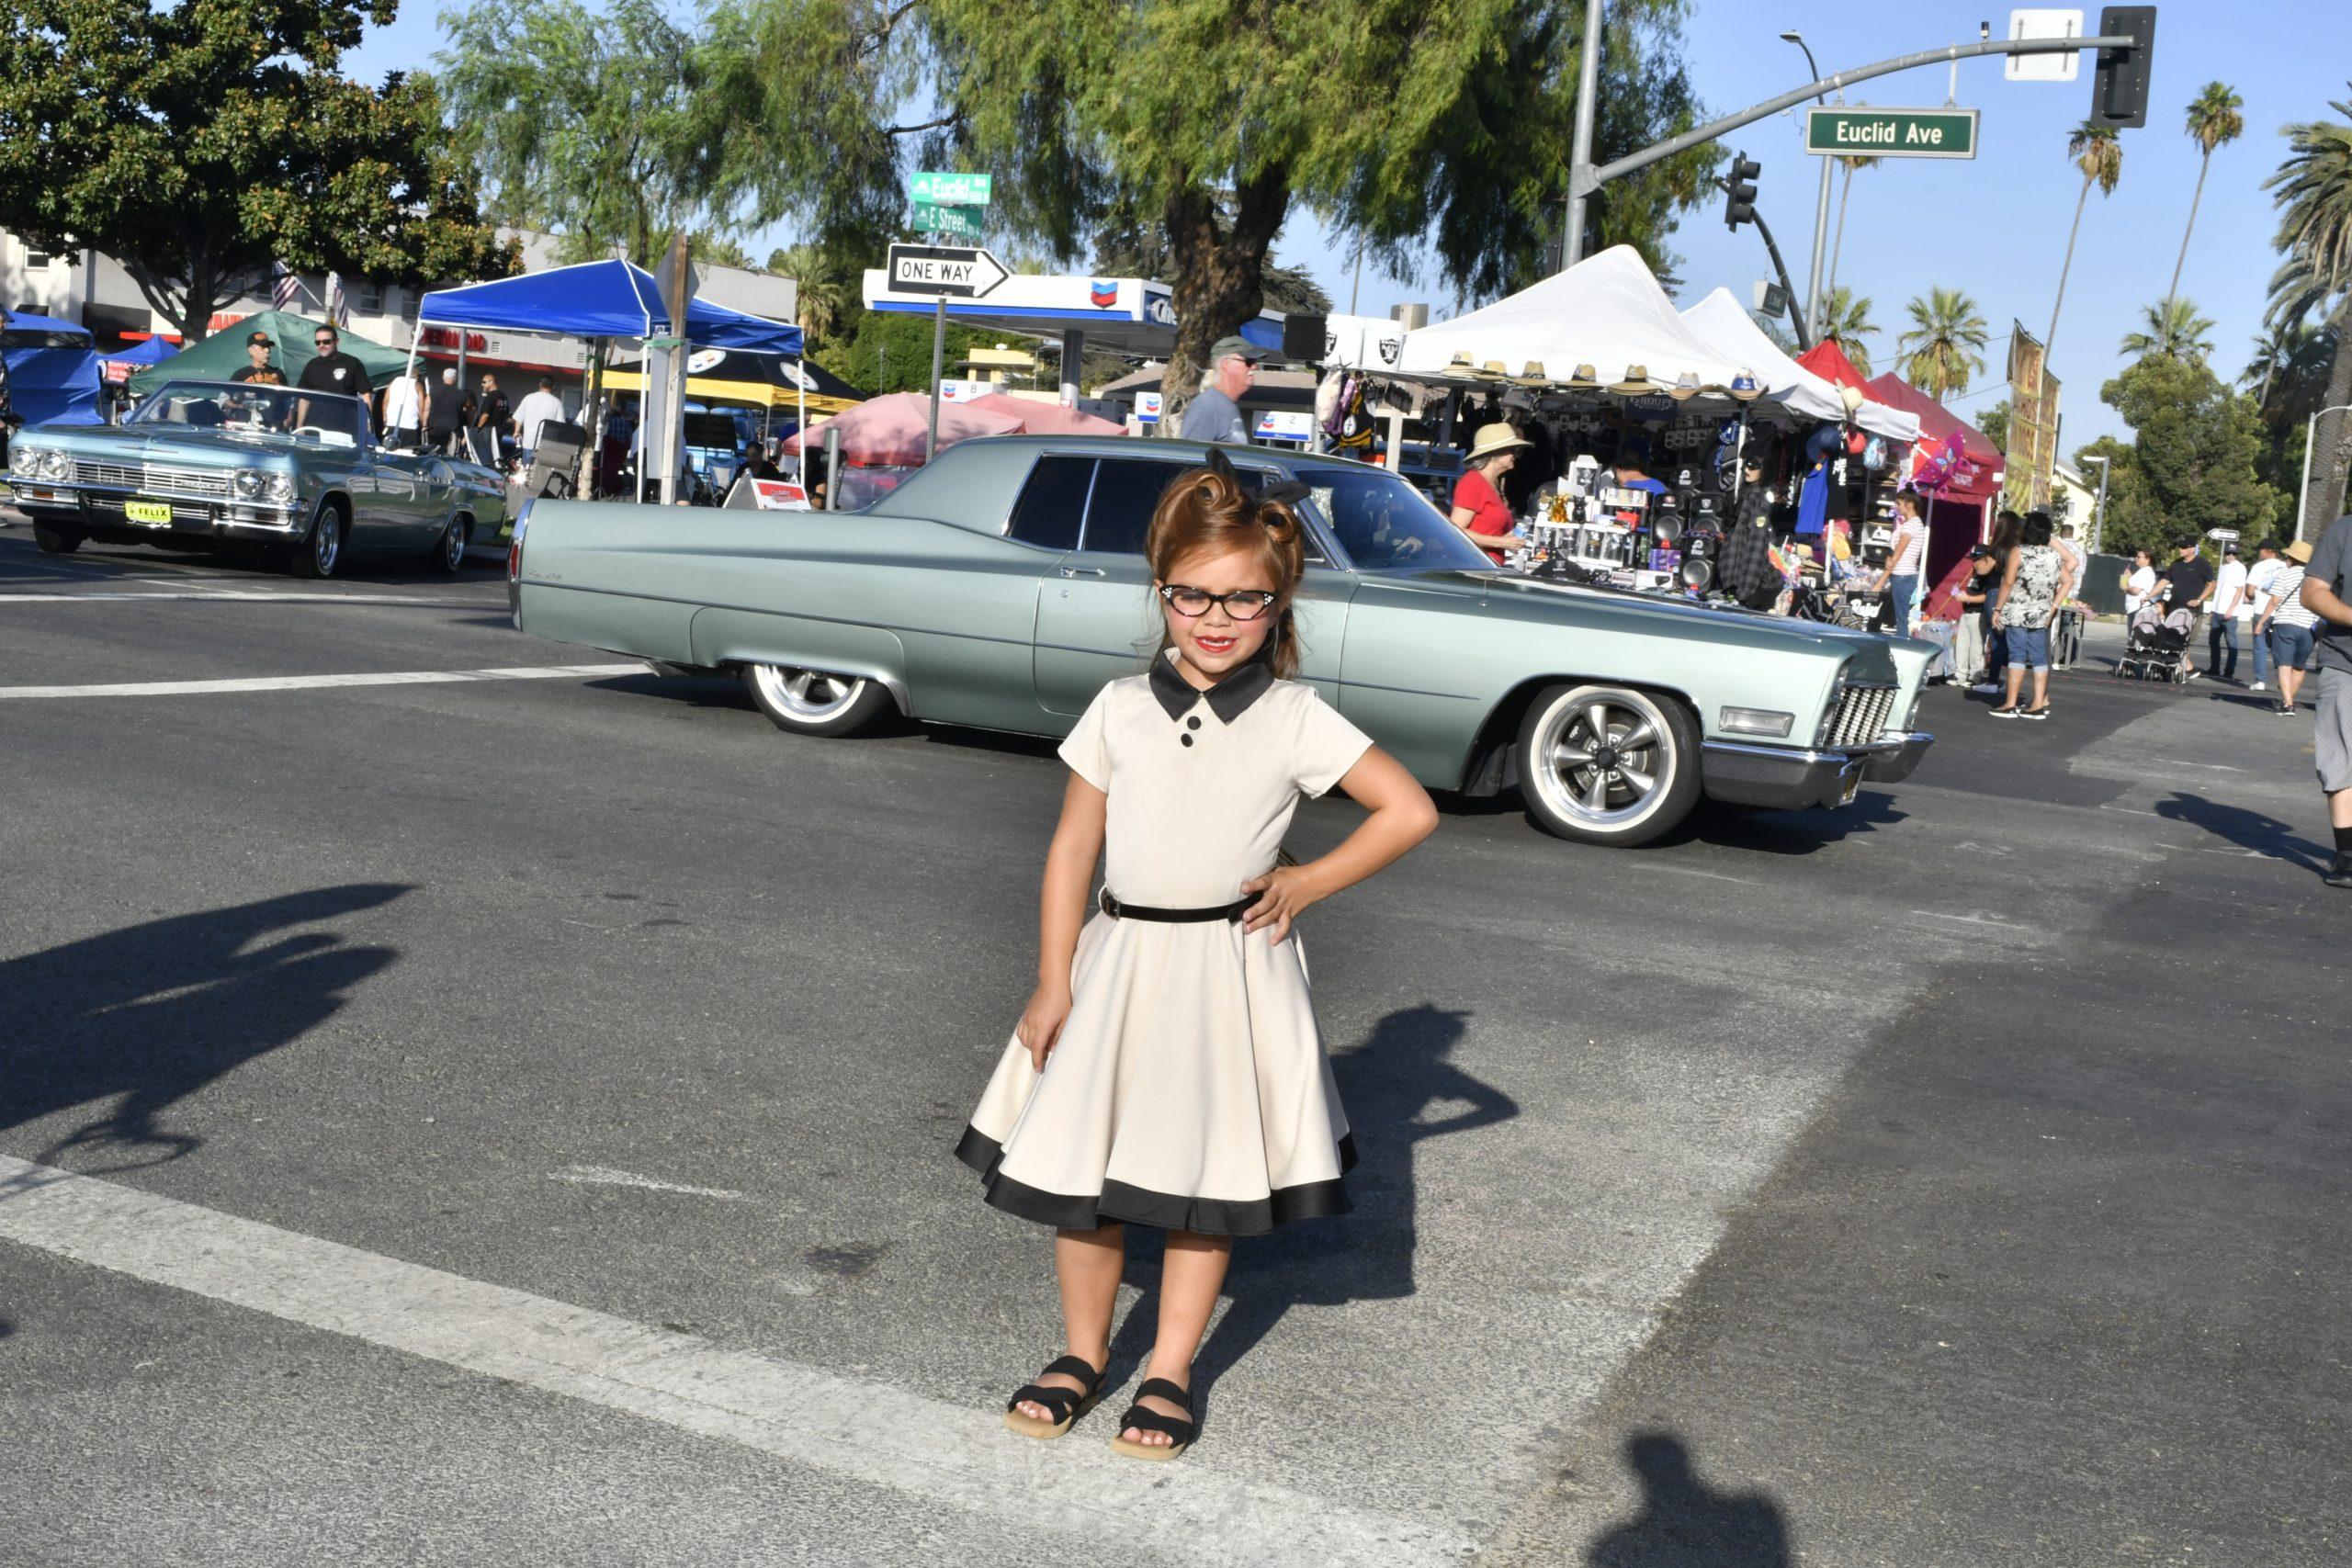 Route 66 Reunion little girl dress up